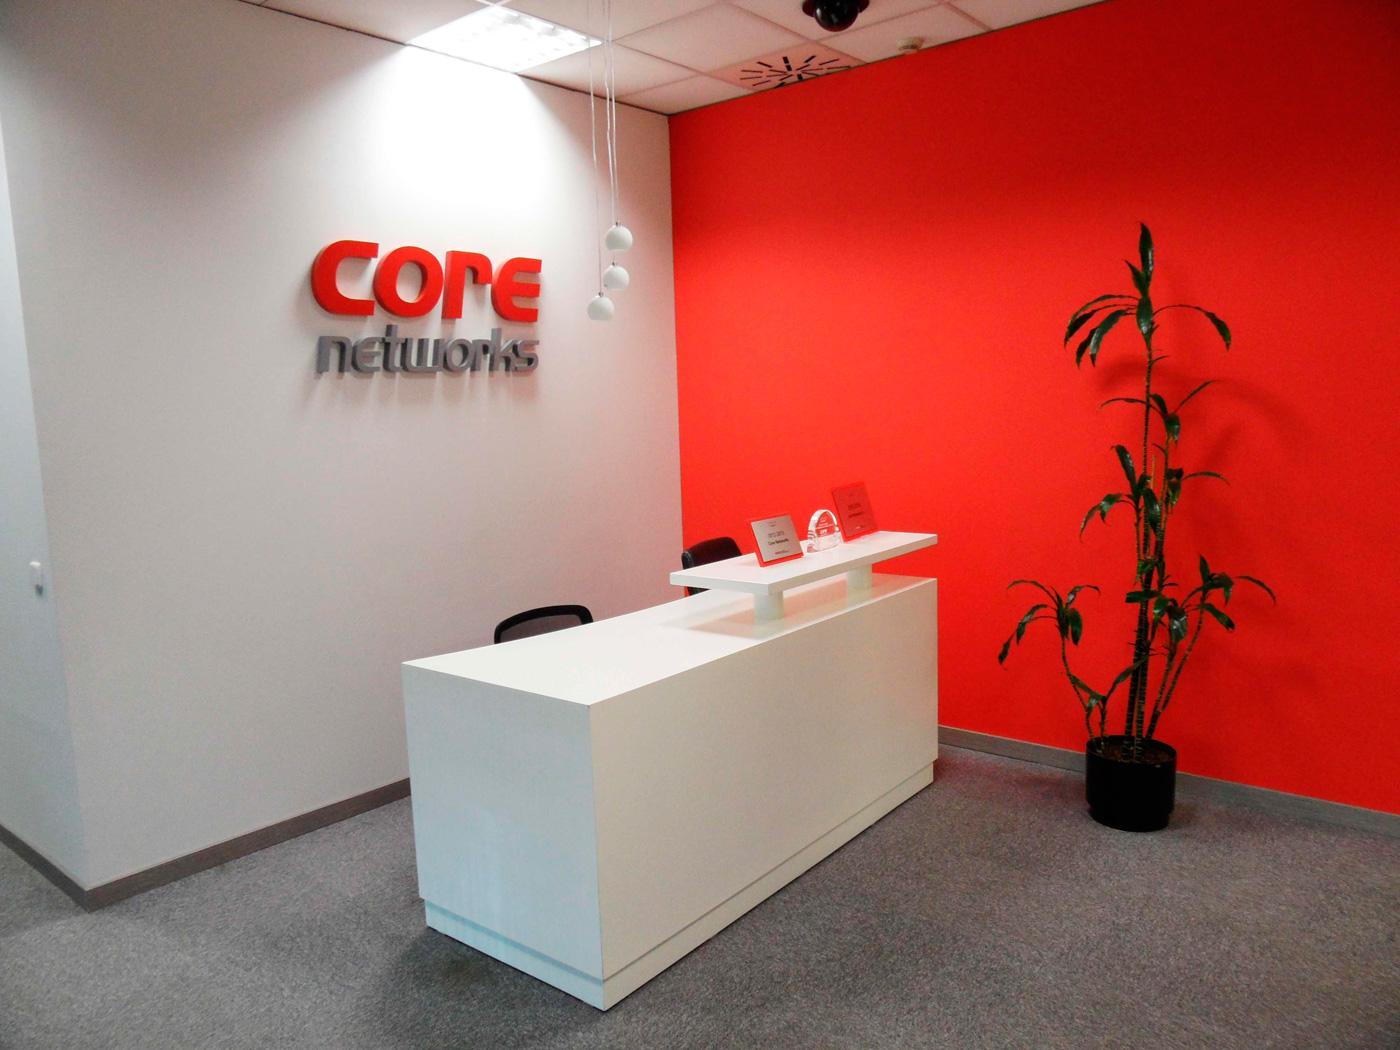 Zona de oficina | Core Networks